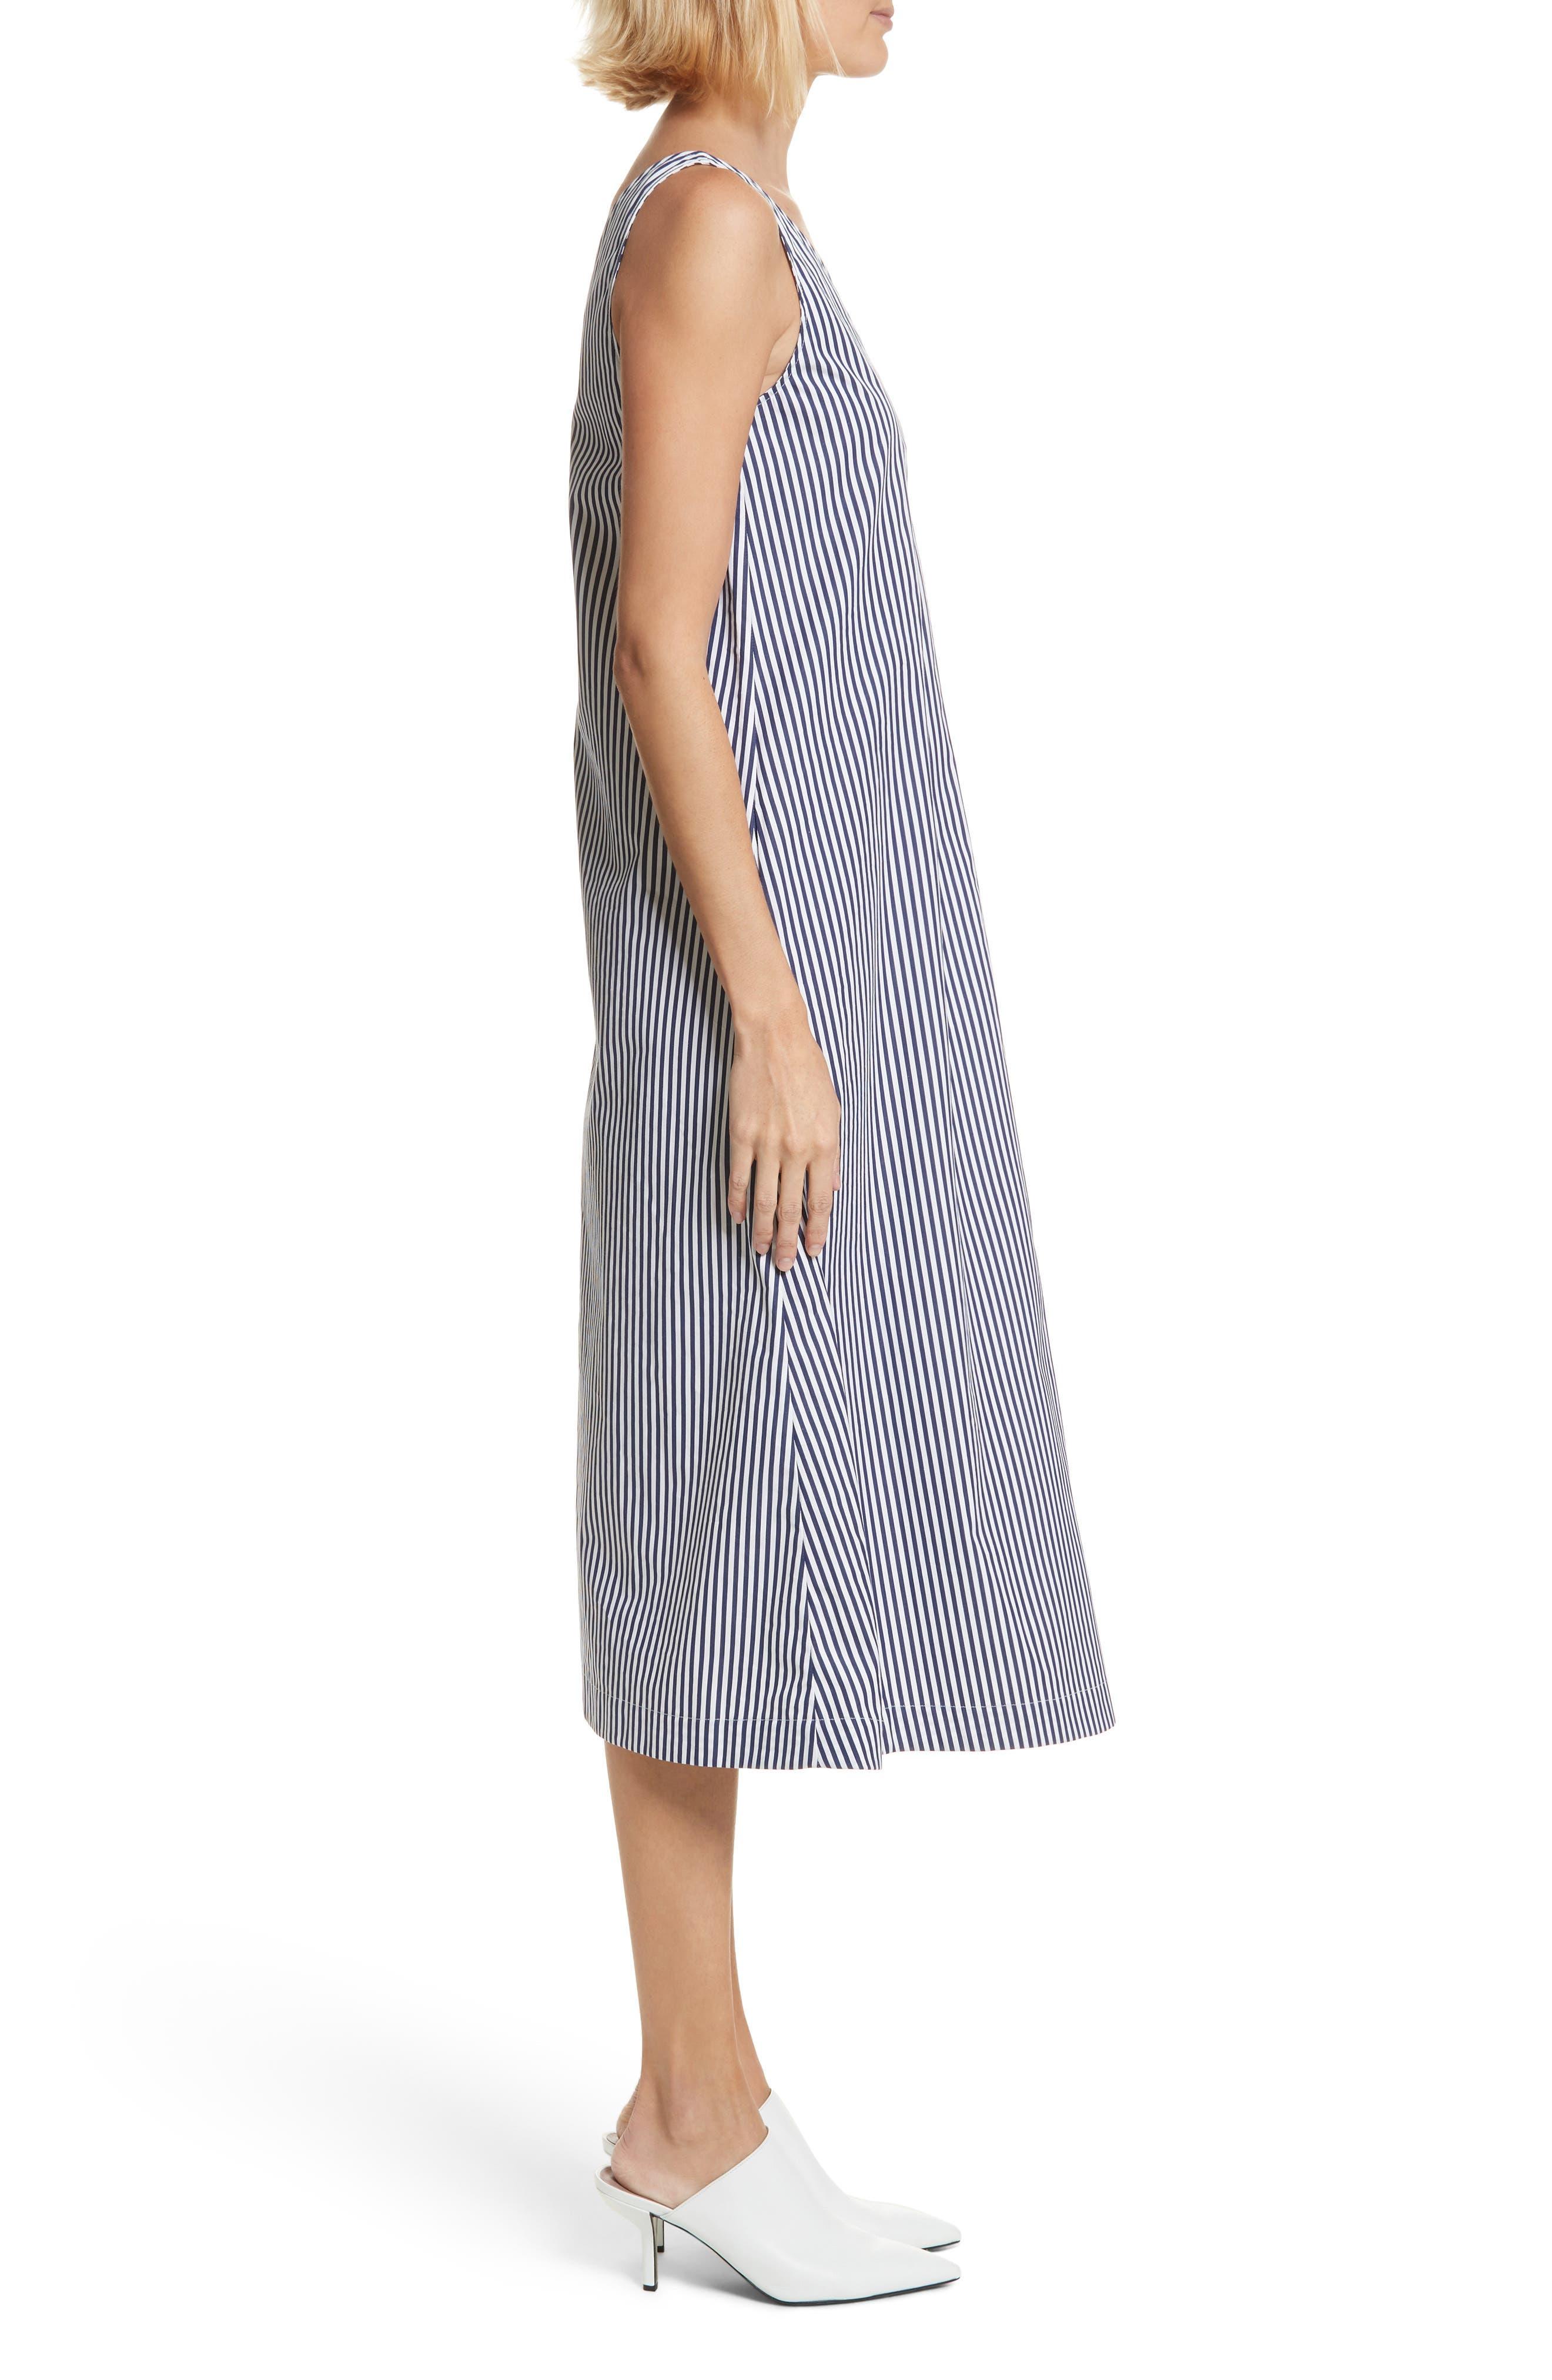 Davey Candy Stripe Shift Dress,                             Alternate thumbnail 3, color,                             456